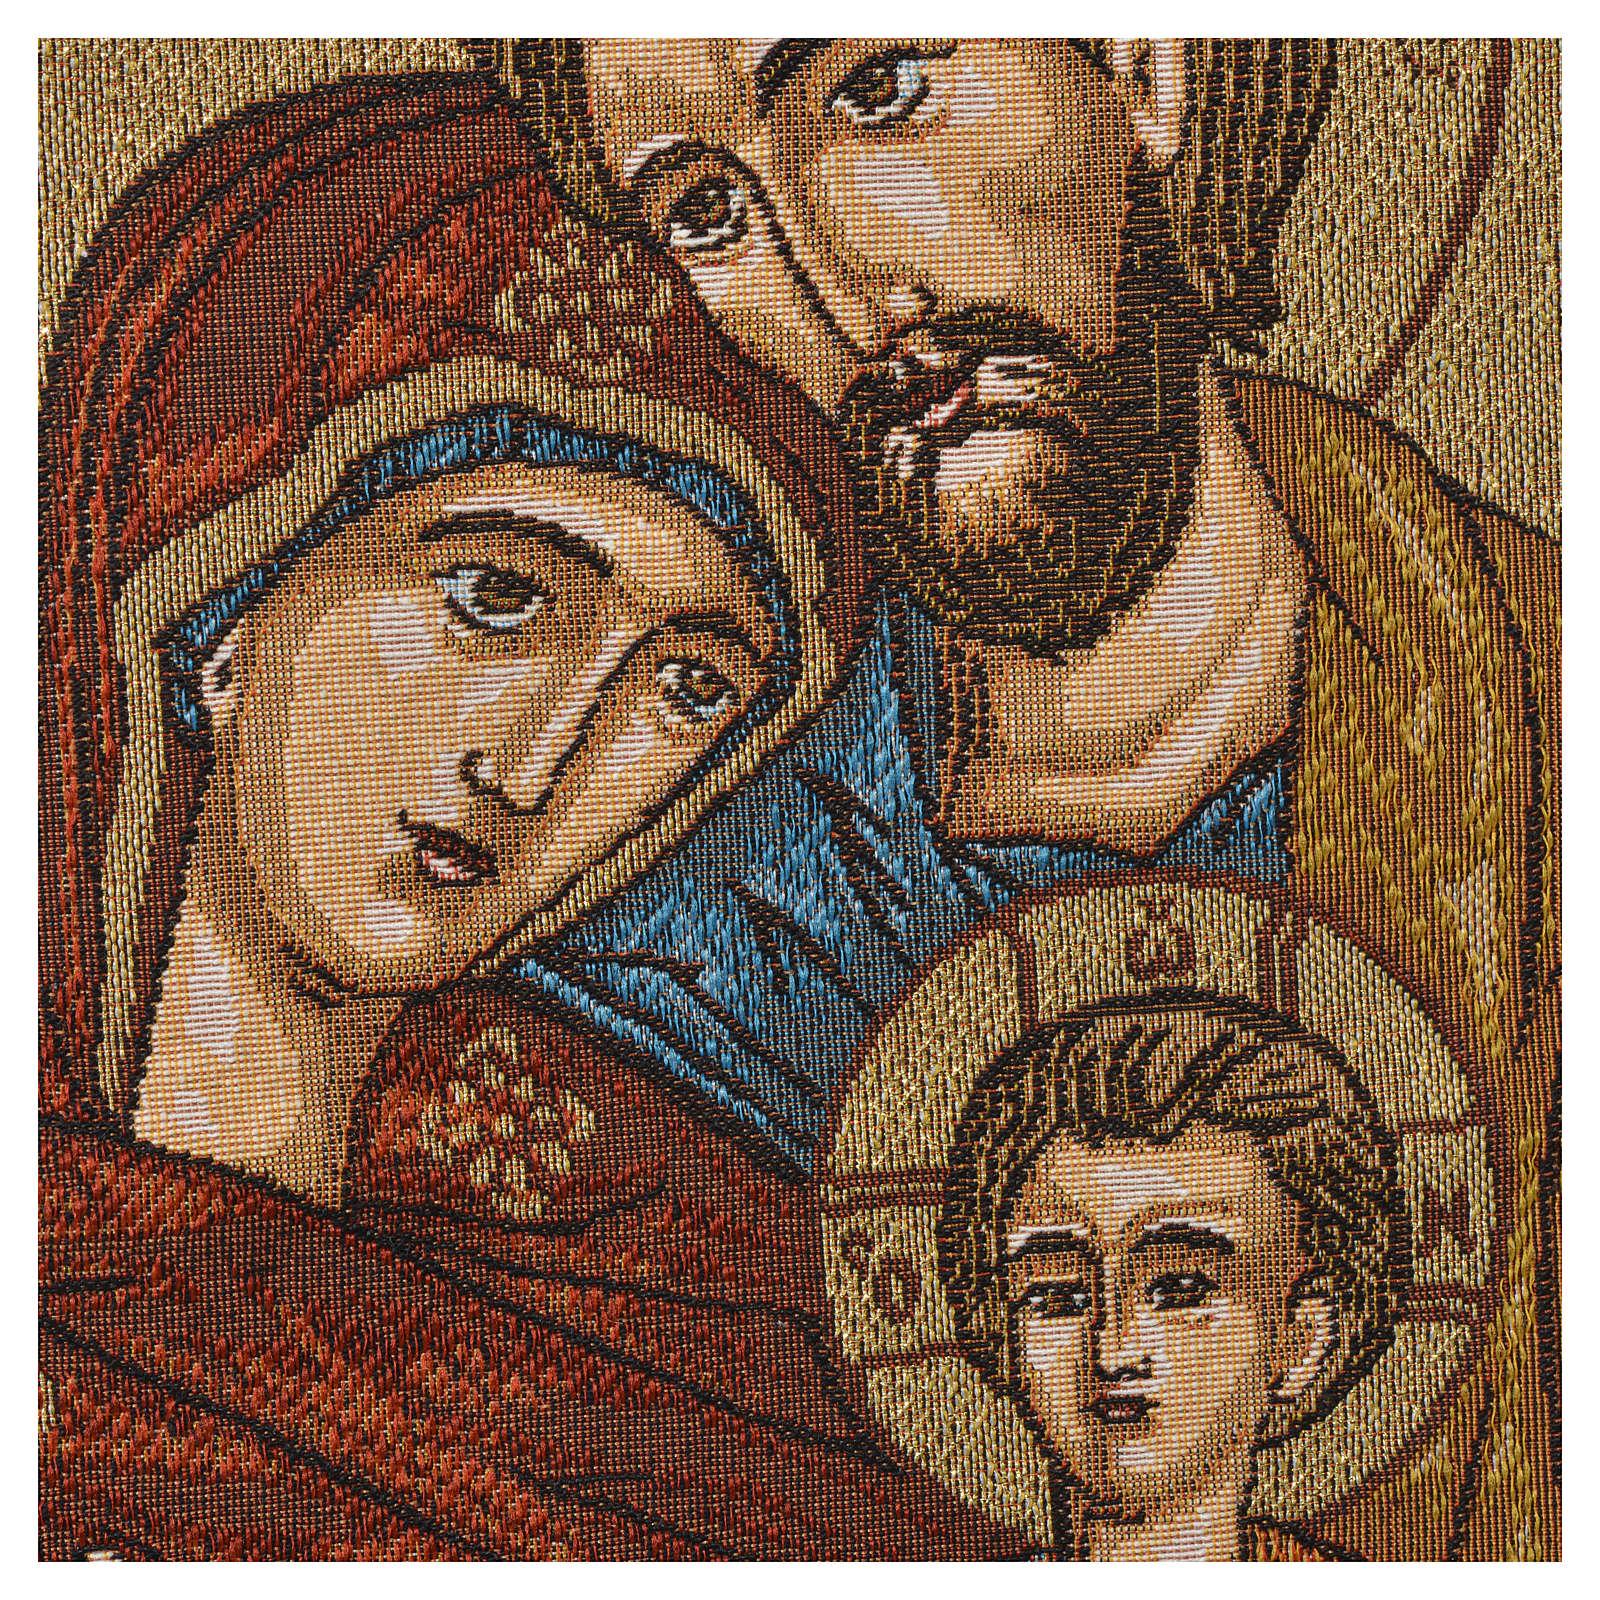 Tapisserie Sainte Famille 34x47cm 3